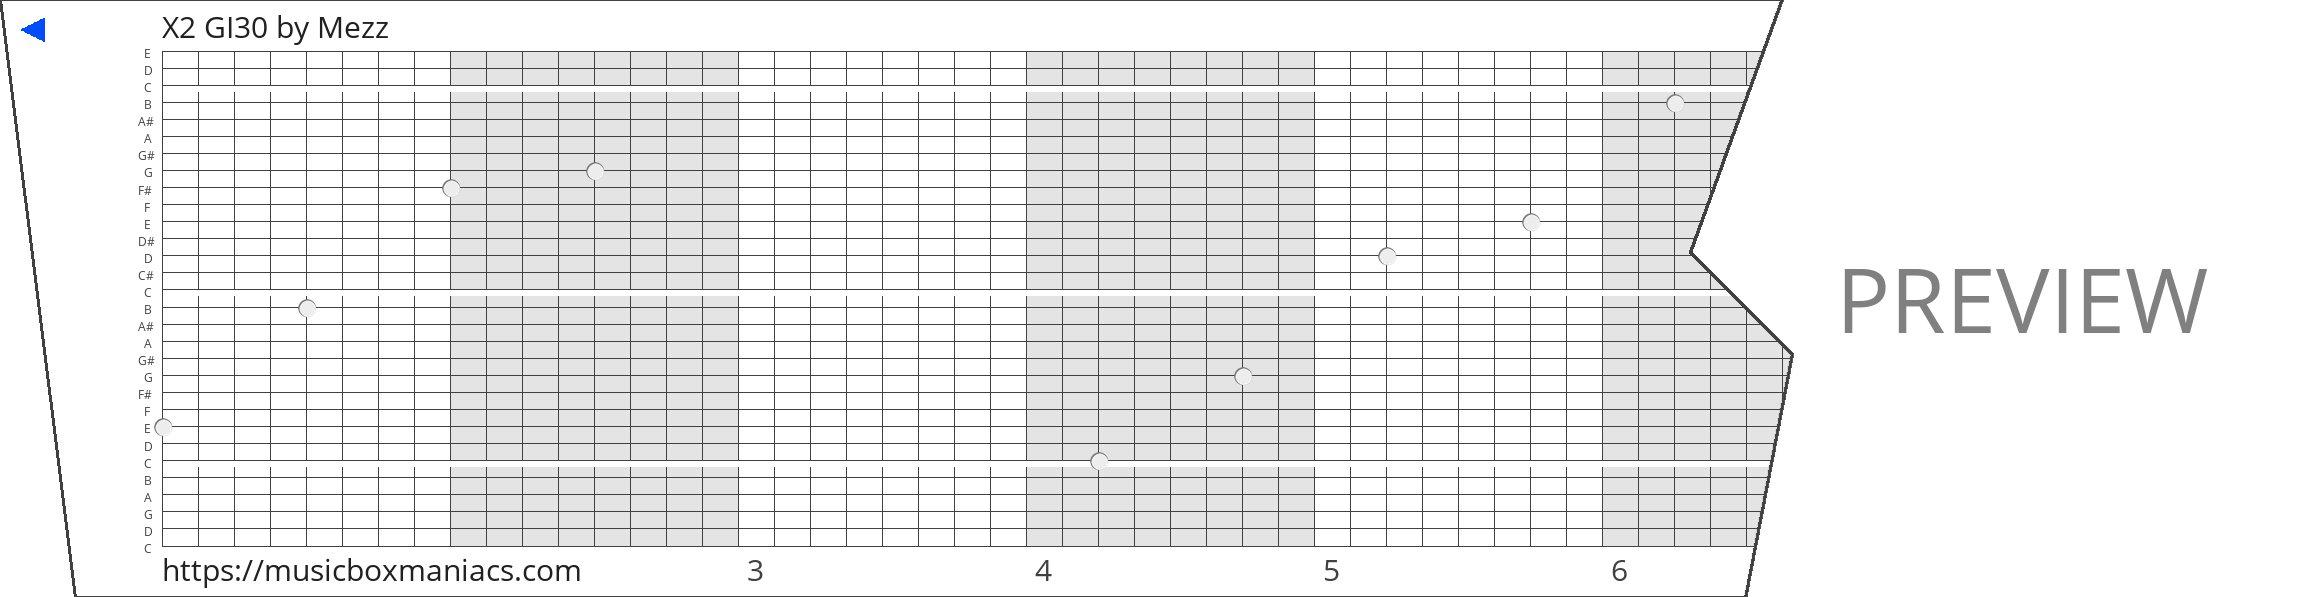 X2 GI30 30 note music box paper strip